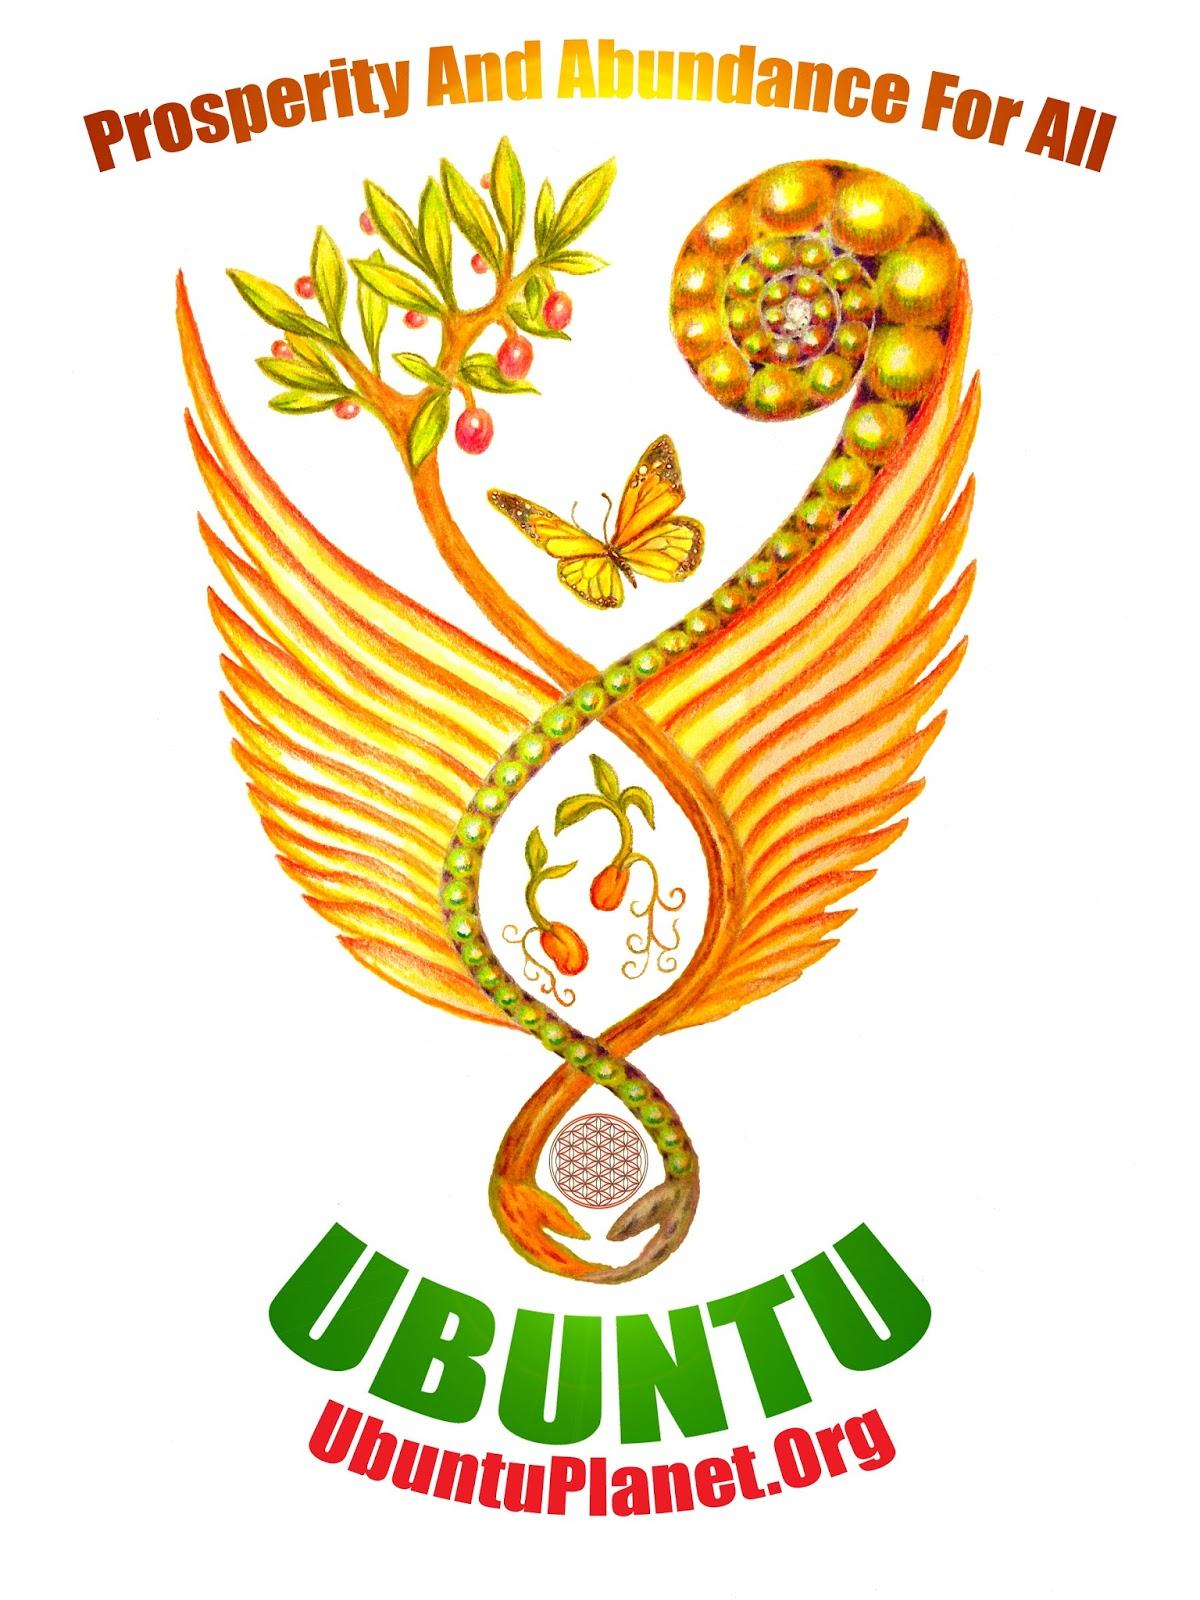 Inspirational message for a new world of abundance ubuntu planet michael tellinger buycottarizona